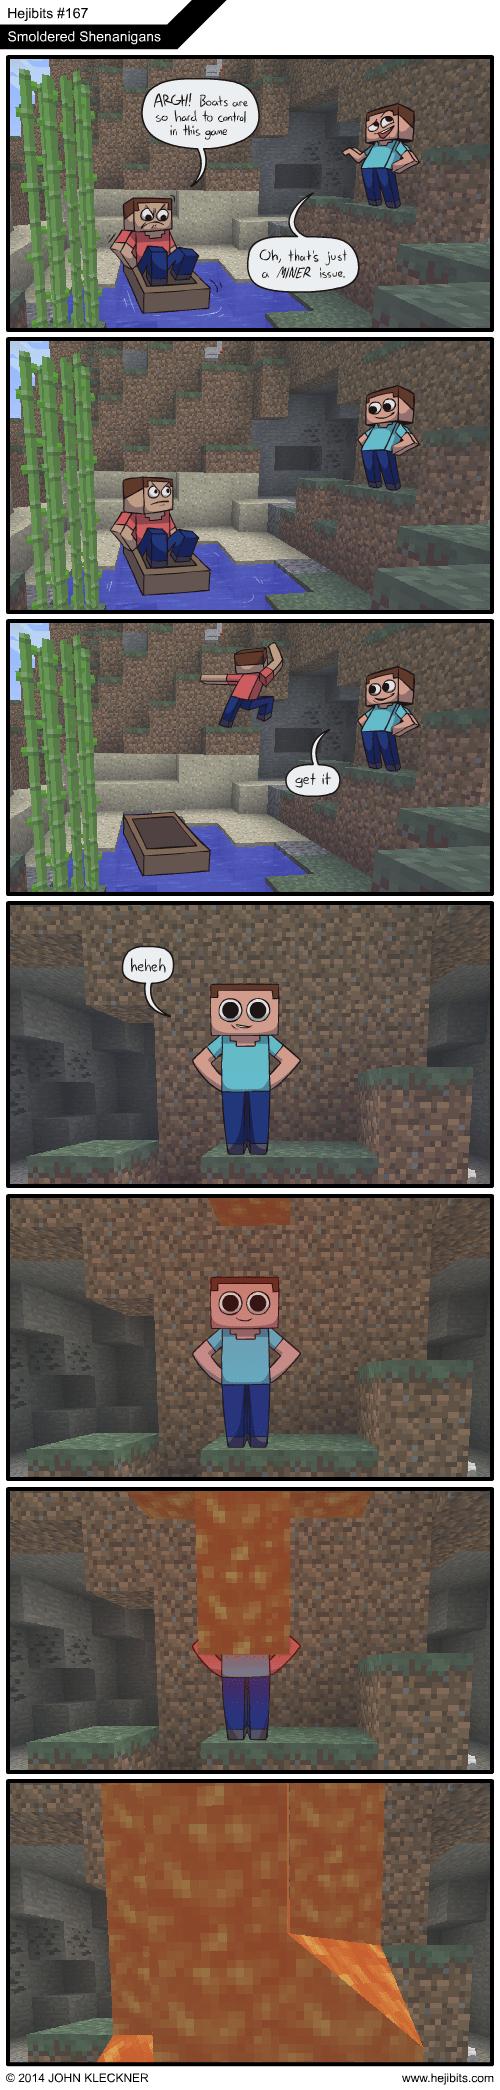 puns minecraft web comics hejibits - 8248035584